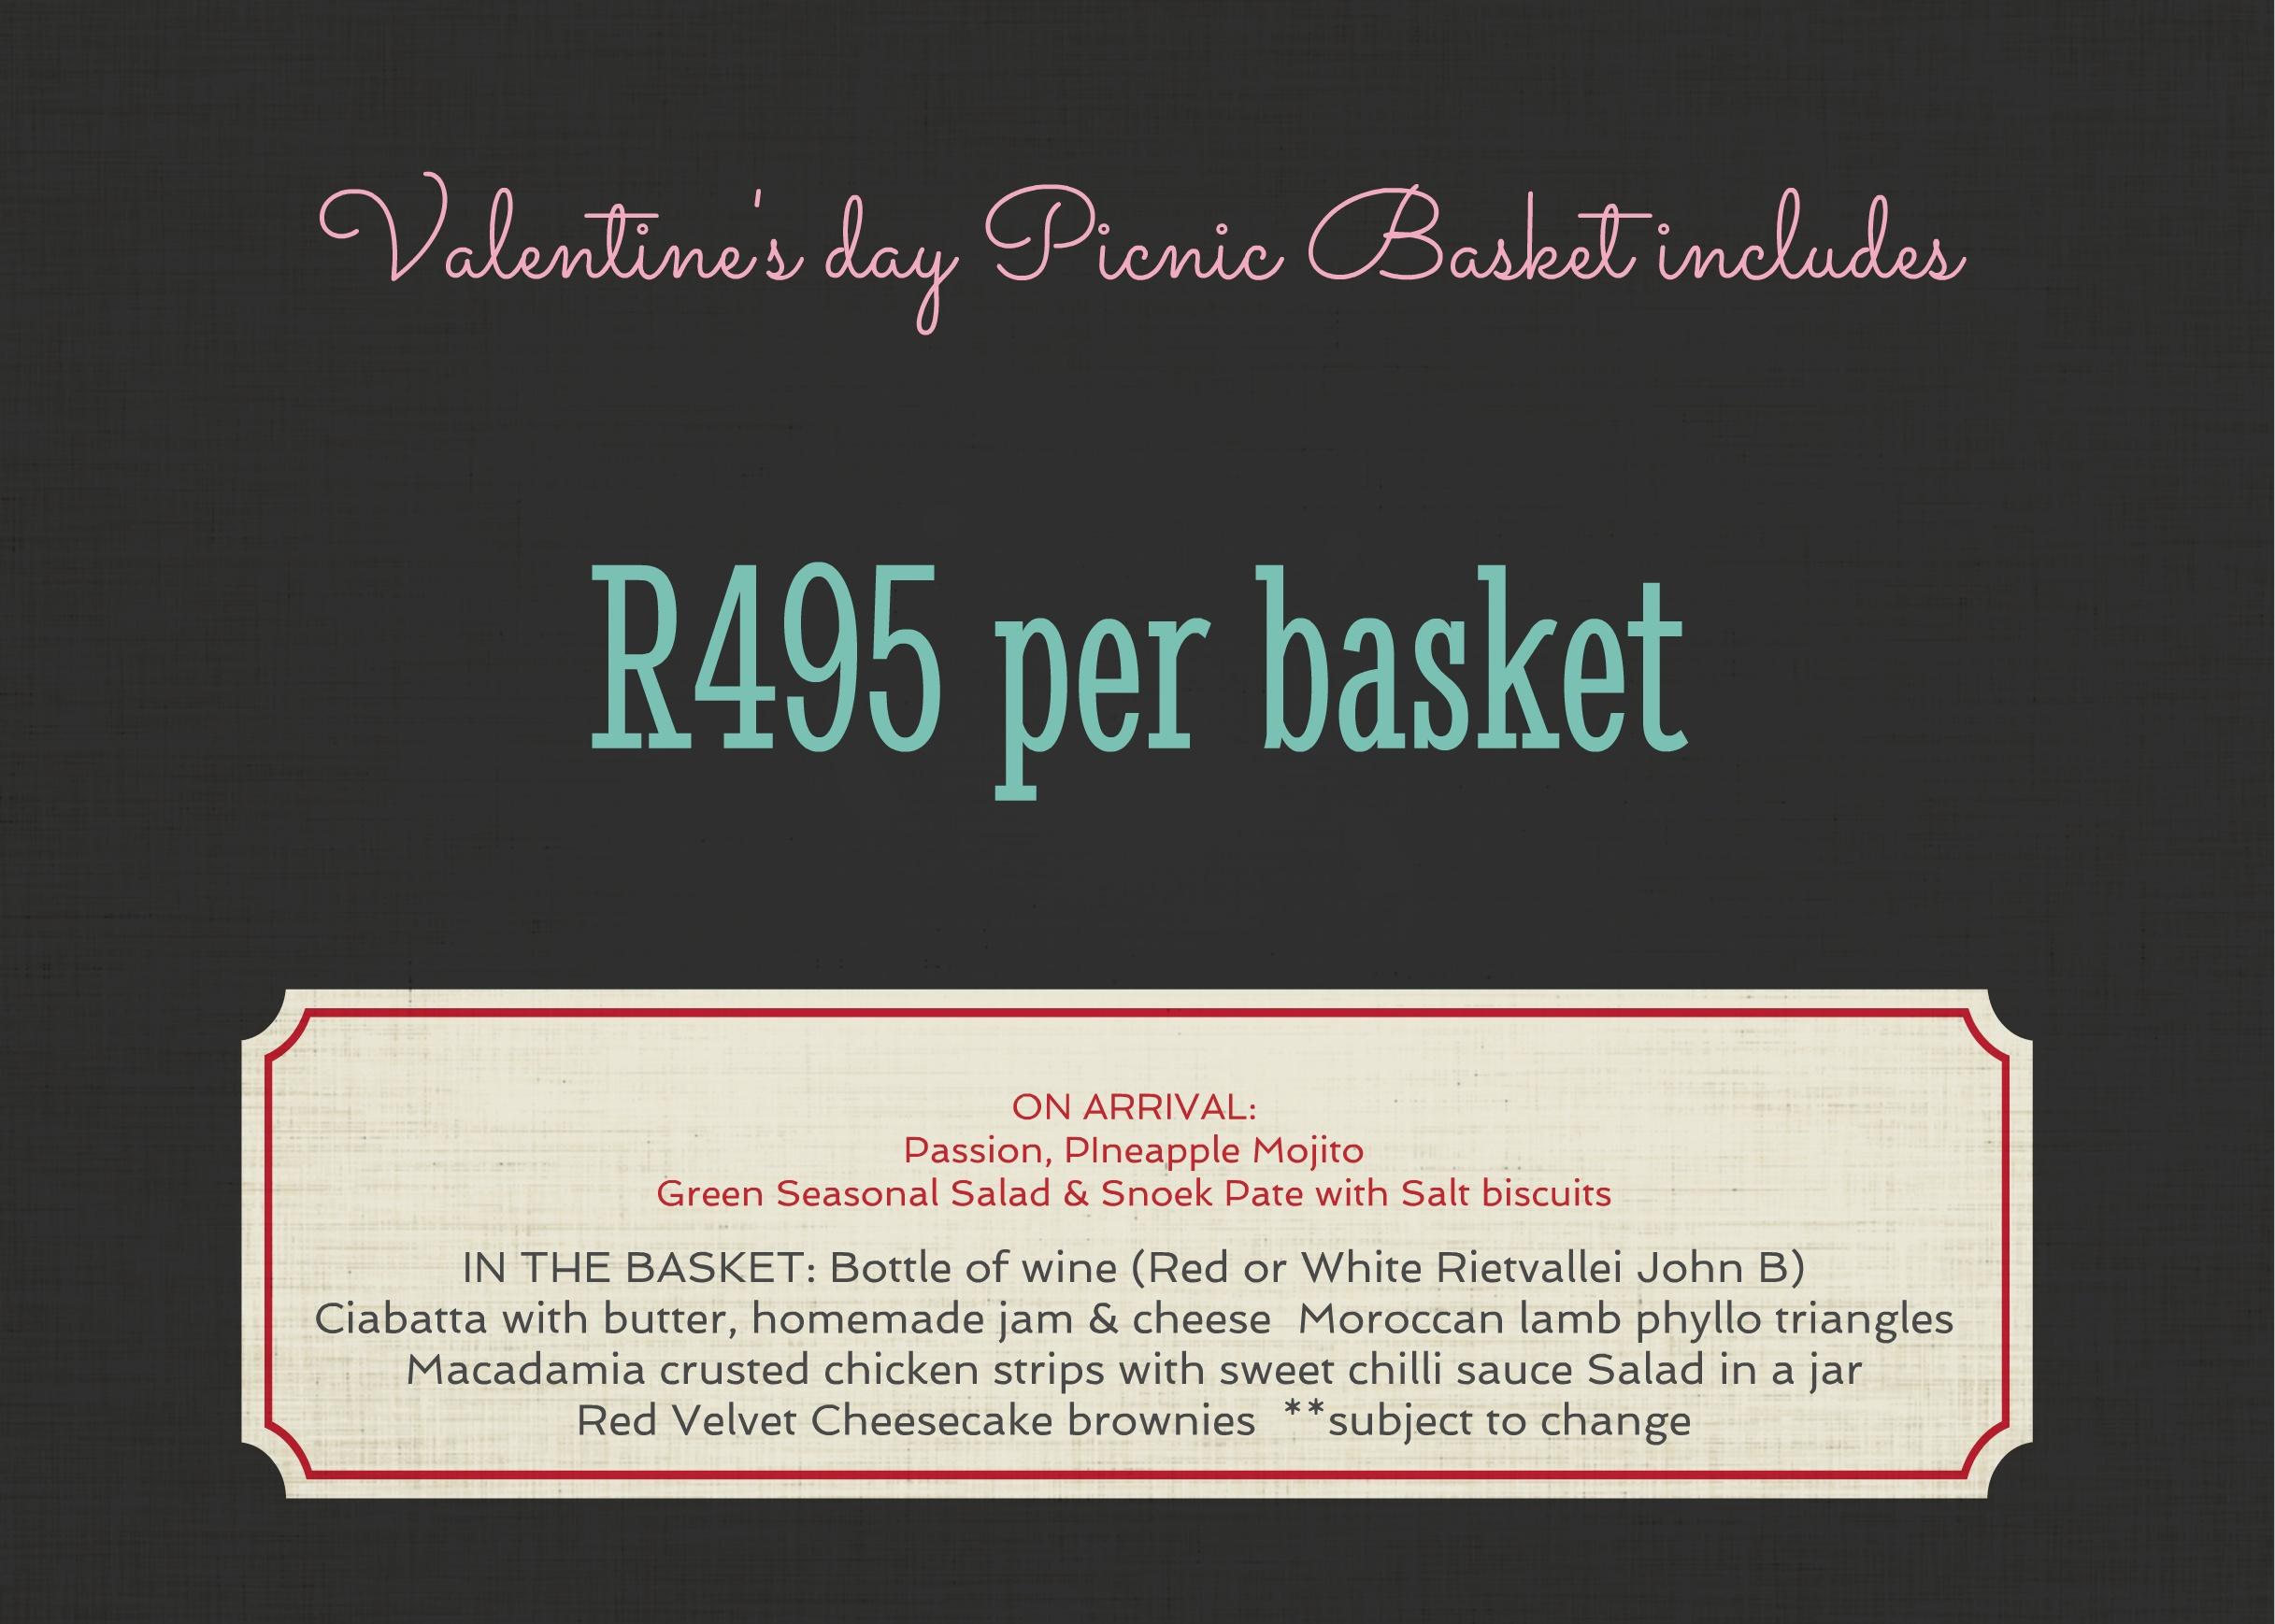 Picnic basket menu